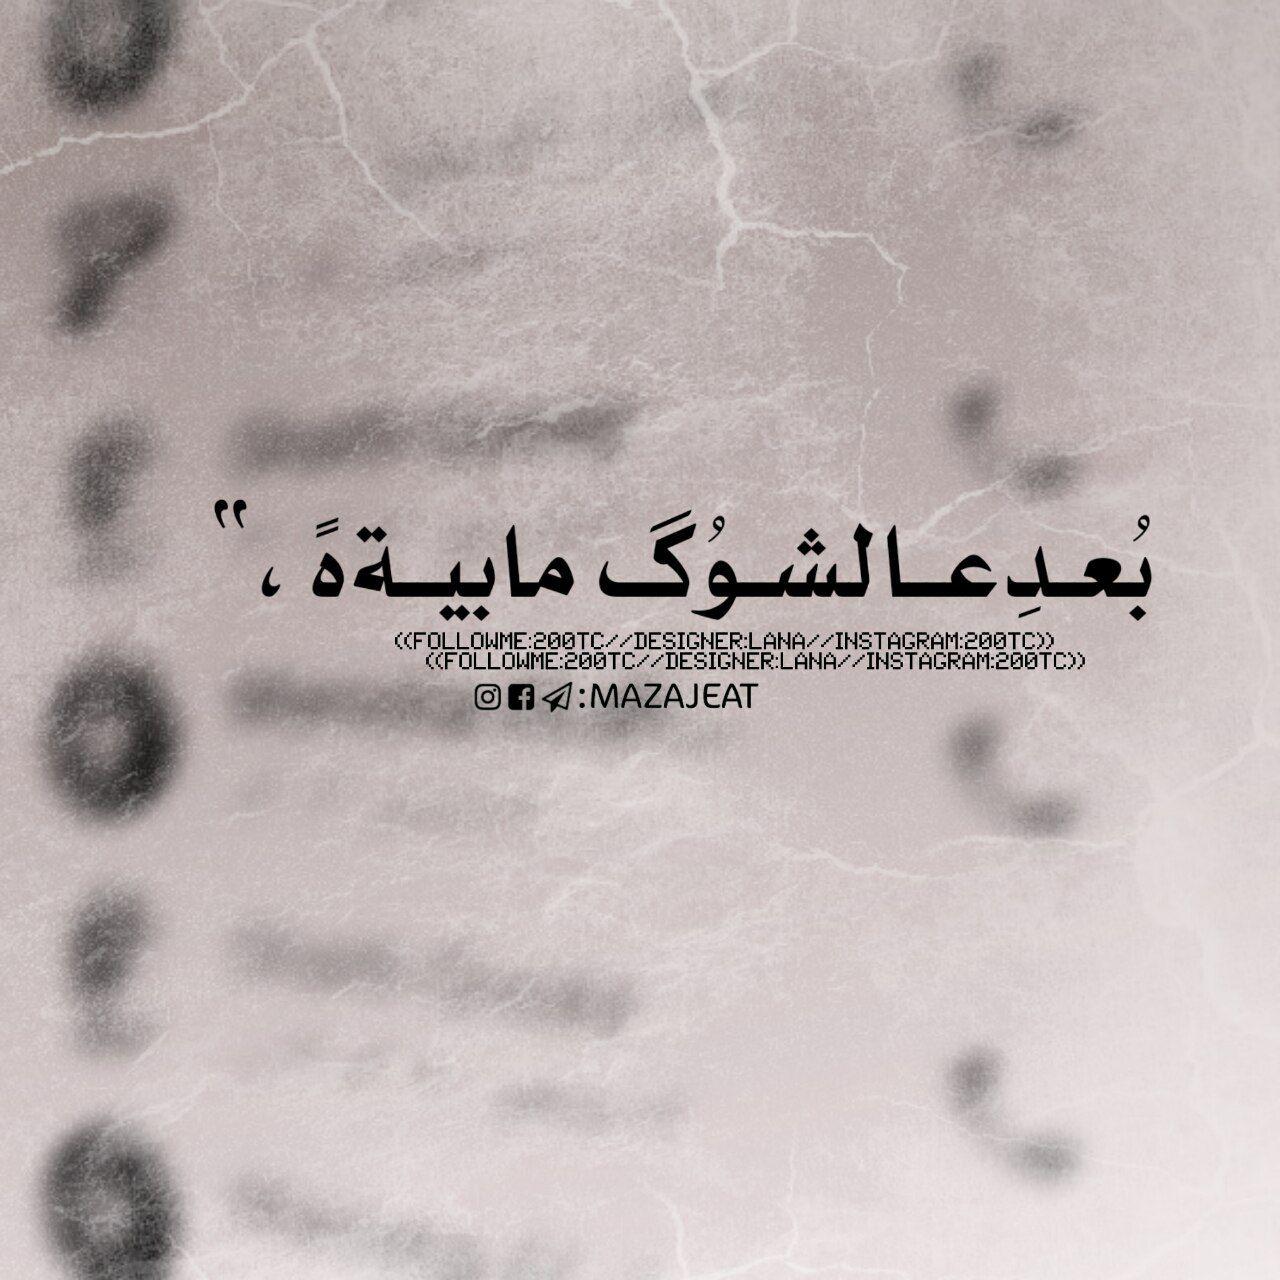 Pin By Luma Sadiq Yousif On بالعربي وبالعراقي Words Quotes Messages